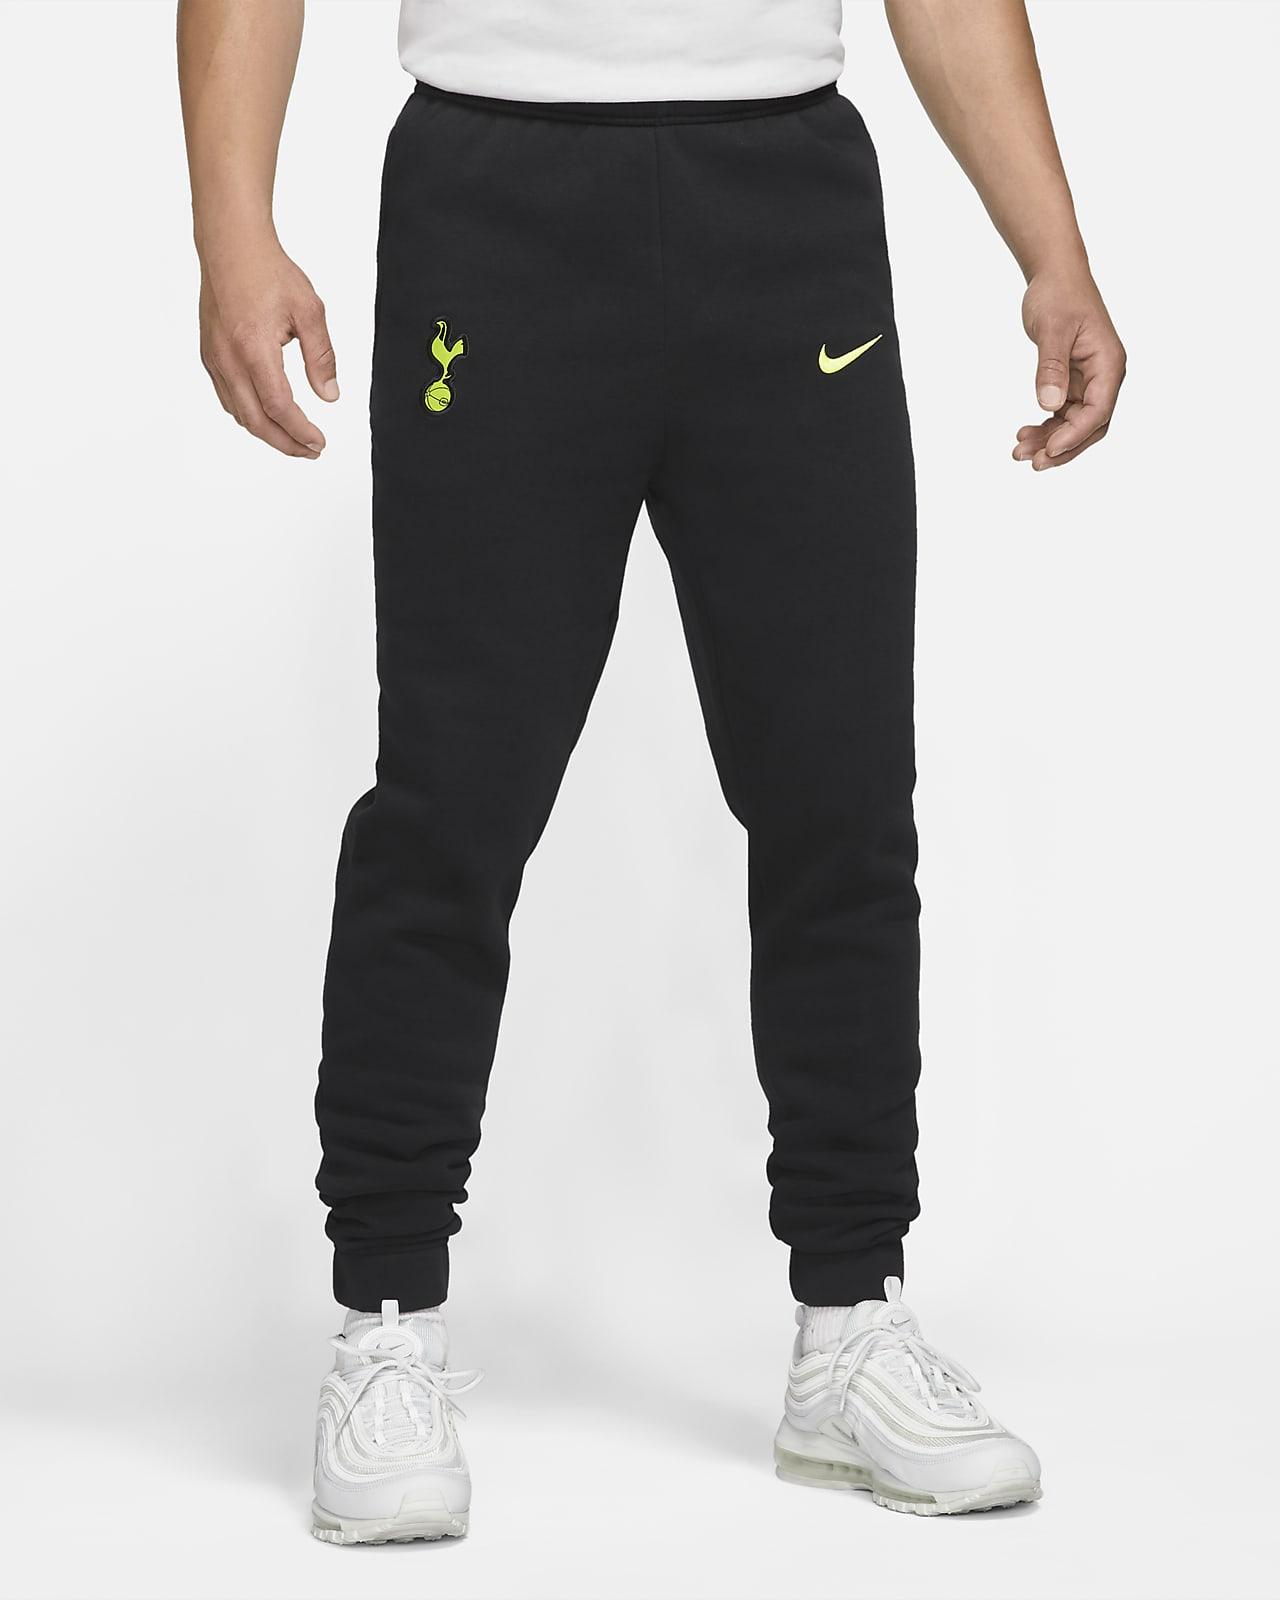 Pantalon de football en tissu Fleece Tottenham Hotspur pour Homme